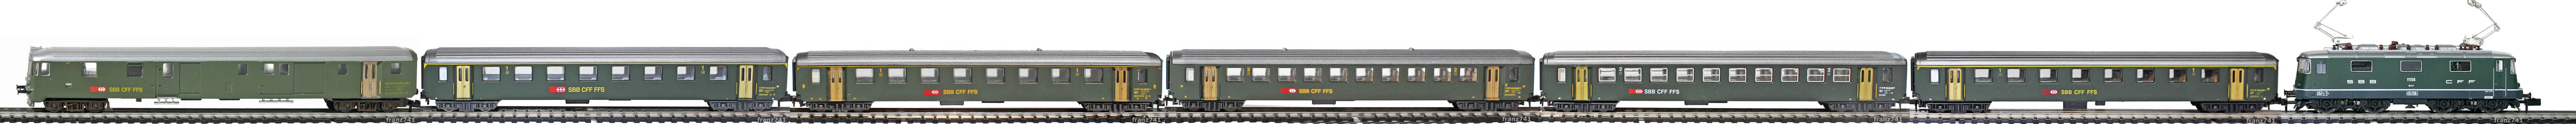 Epoche-IV-SBB-EW-I-Personenzug_Re-4-4-II-Elok-DZt-EW-I-Wagen-neues-Logo